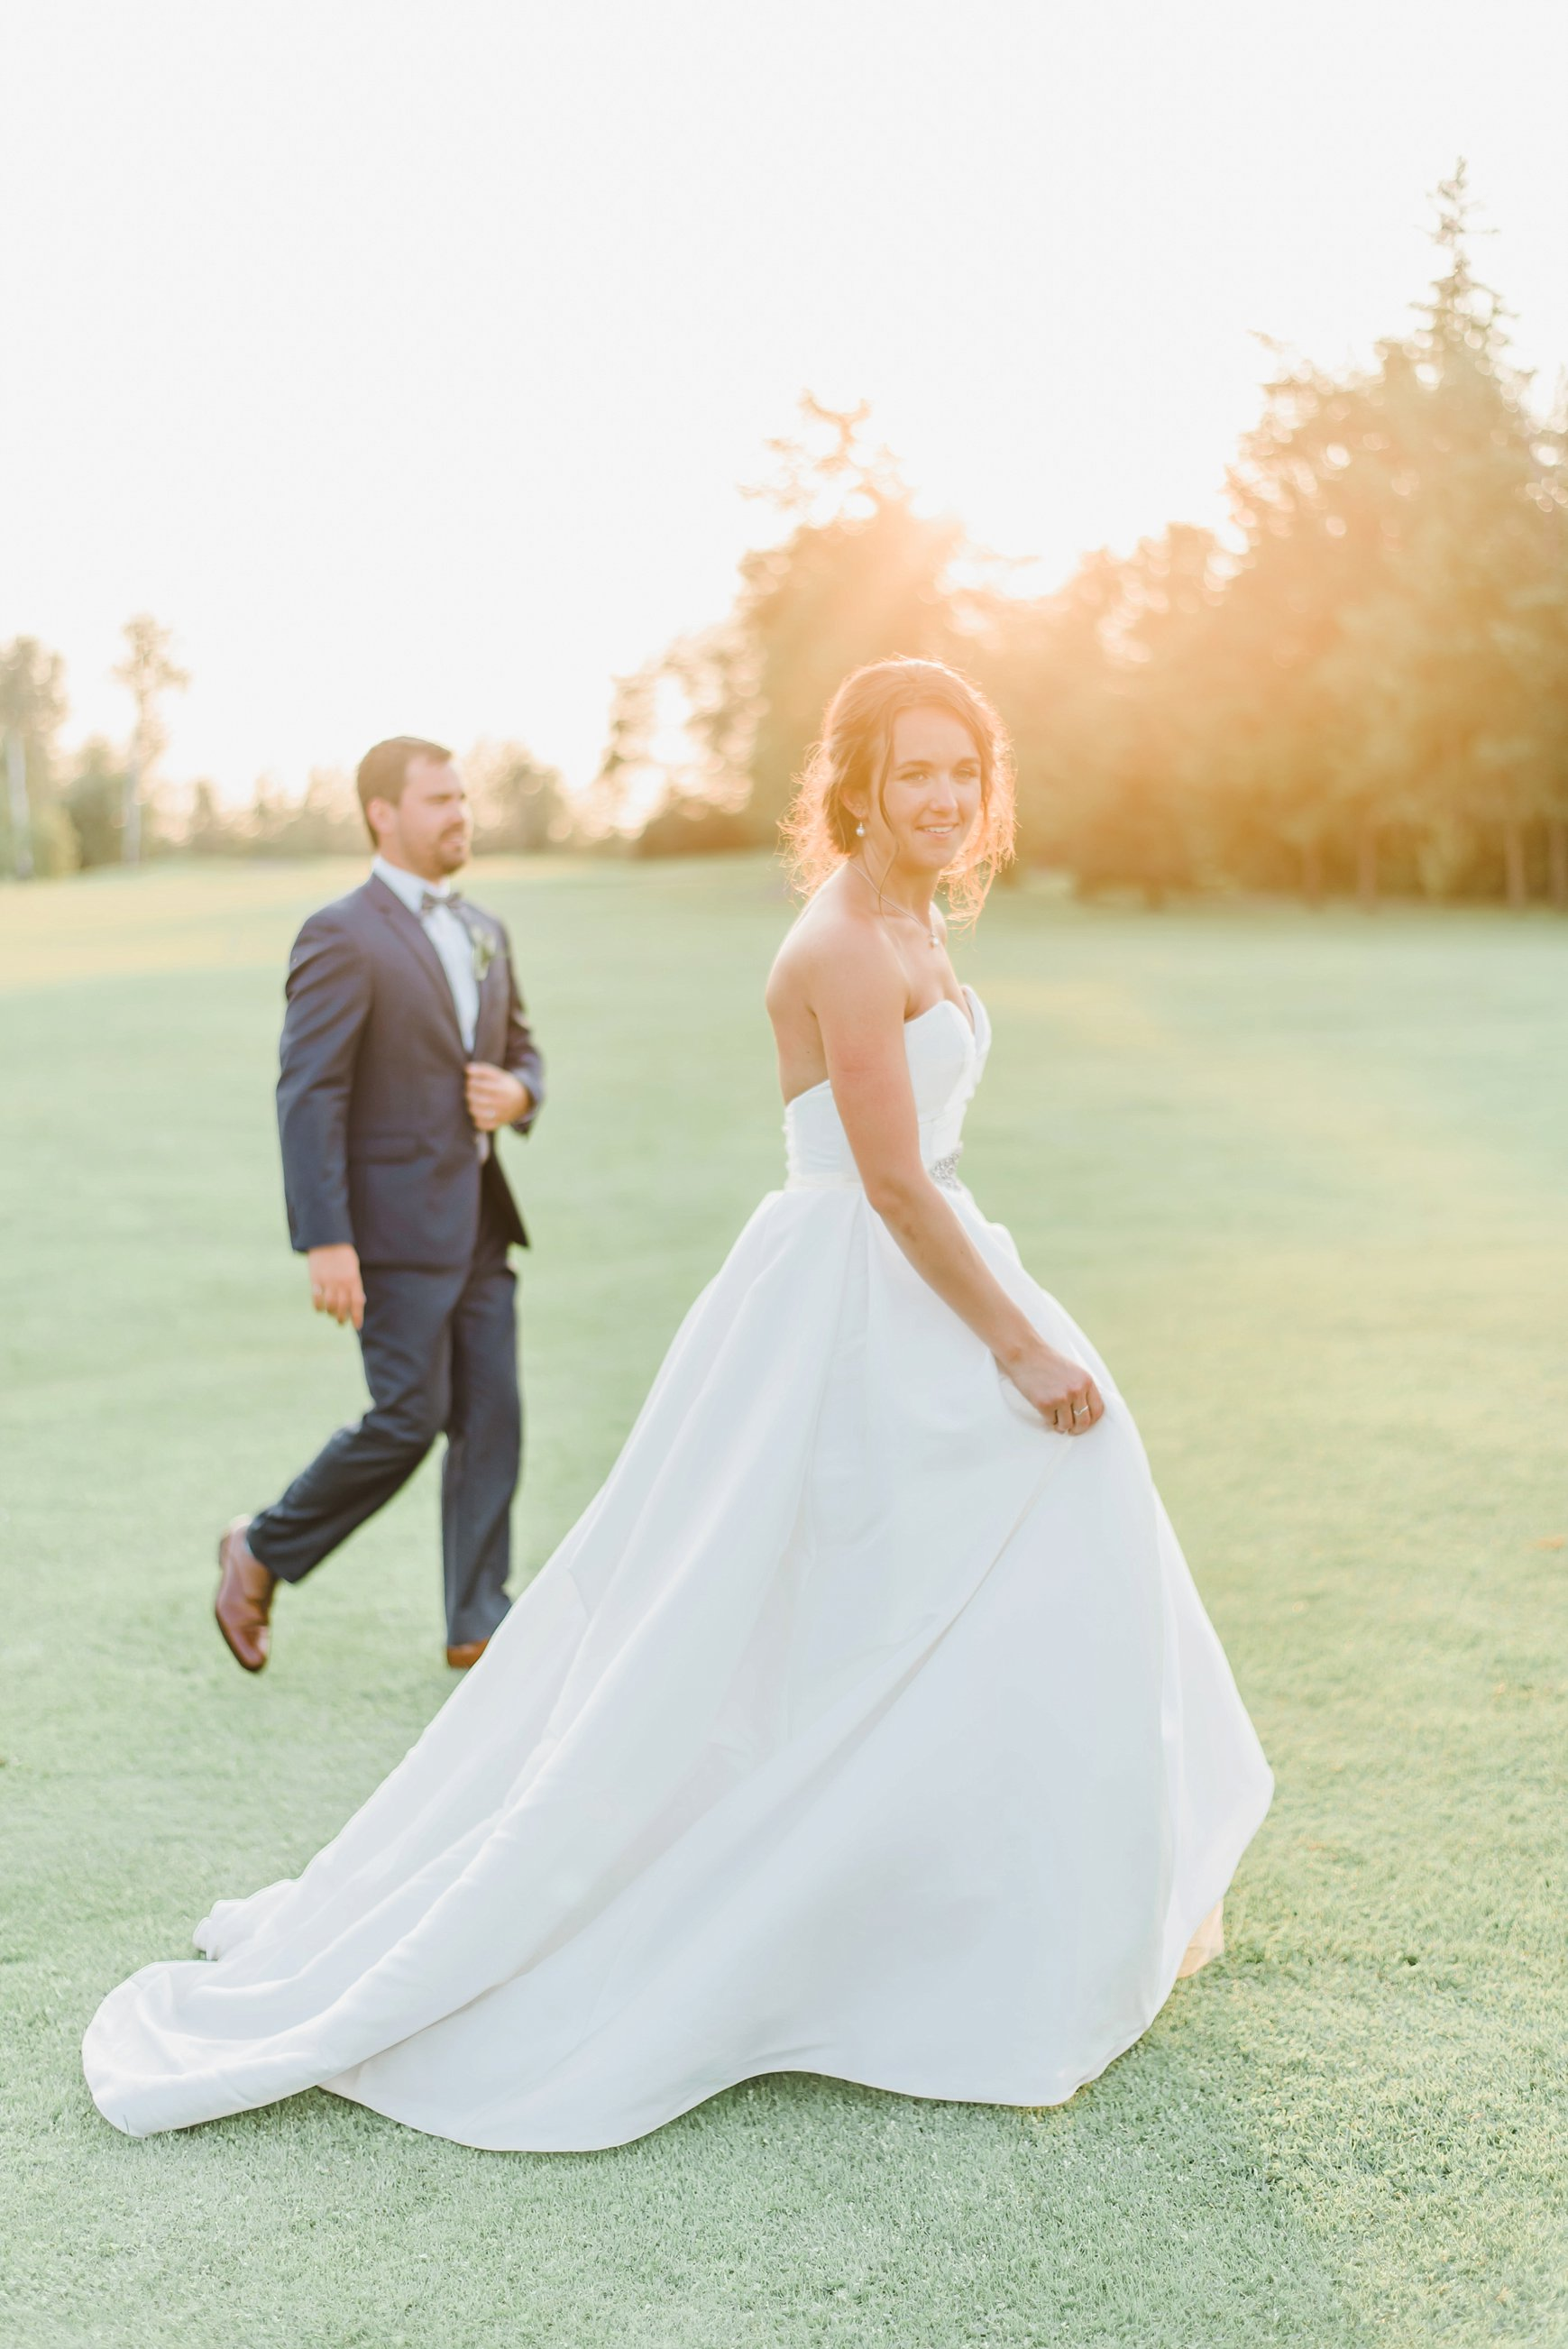 light airy indie fine art ottawa wedding photographer | Ali and Batoul Photography_0577.jpg